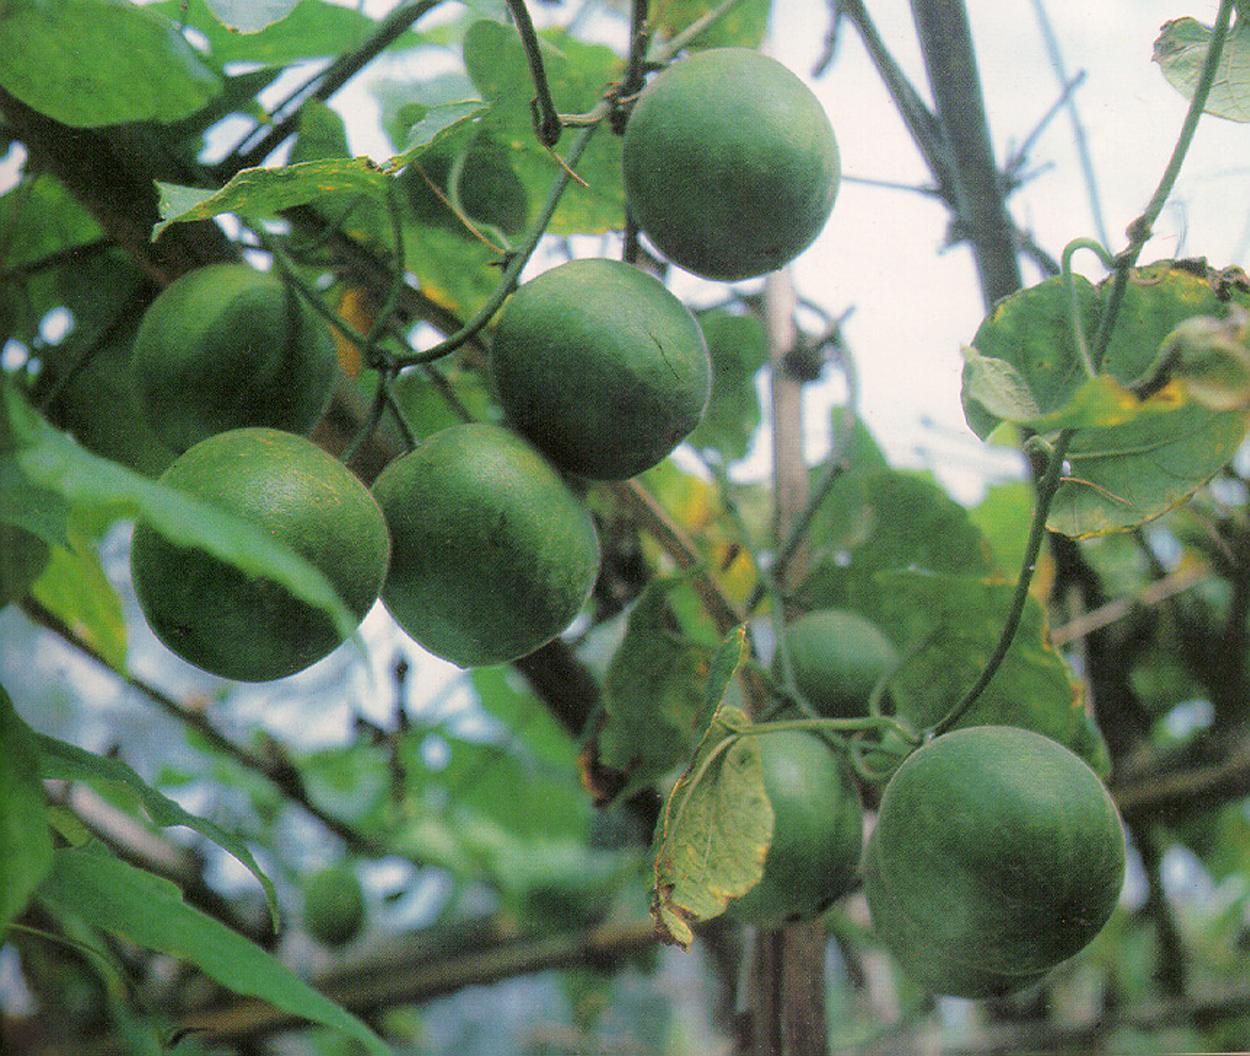 growing luo han guo